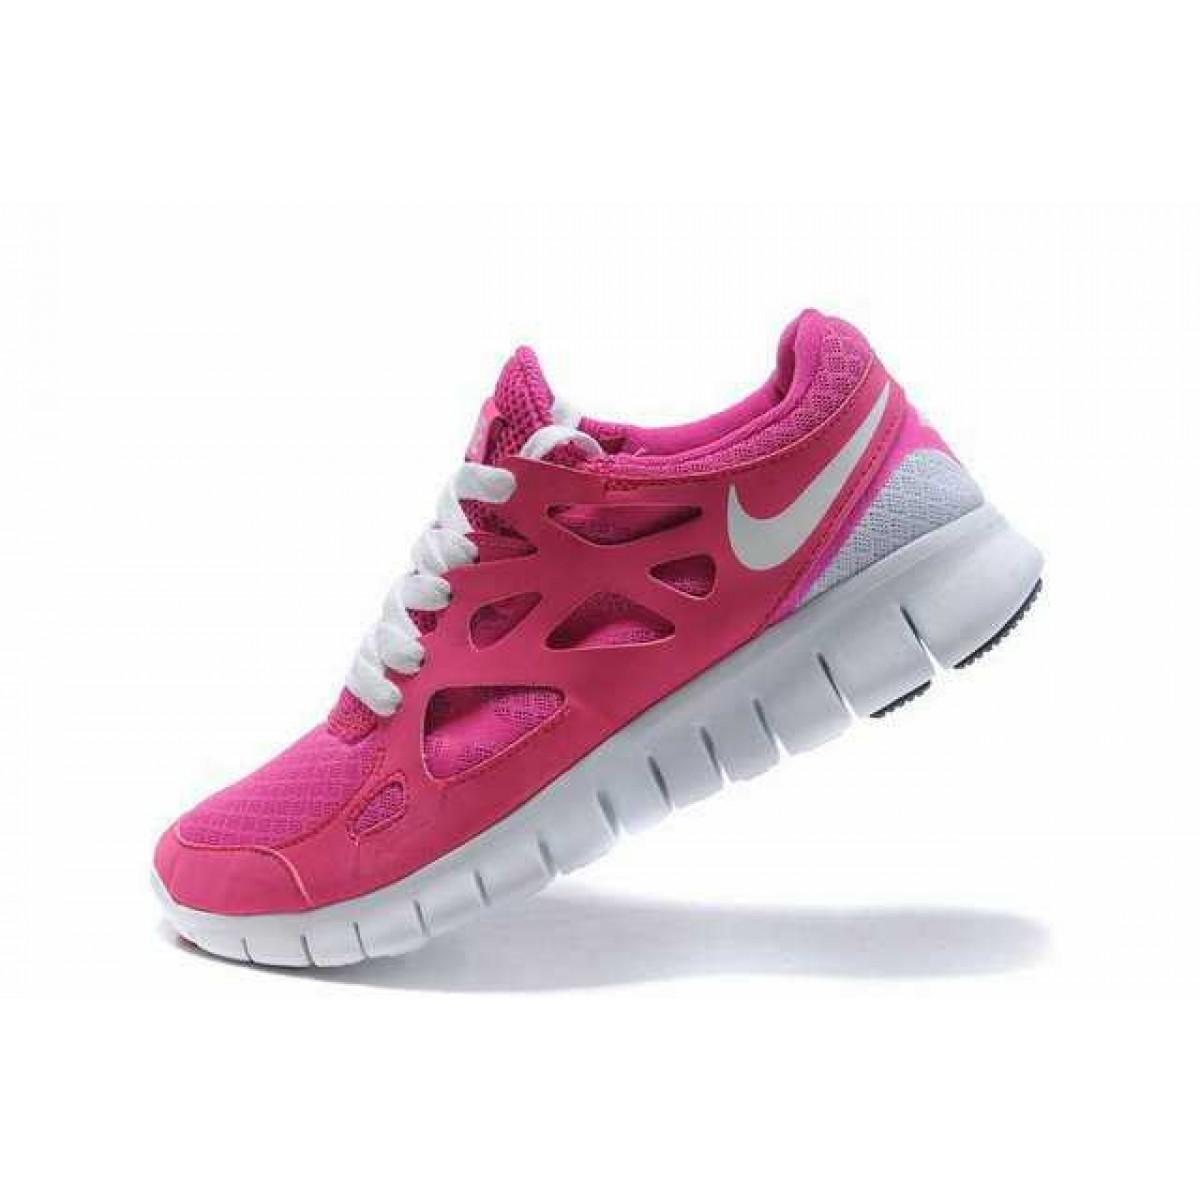 size 40 c7466 8a16e Nike Free Run 2 Femme Chaussures Rose Blanc,nike free bottes pas cher,en